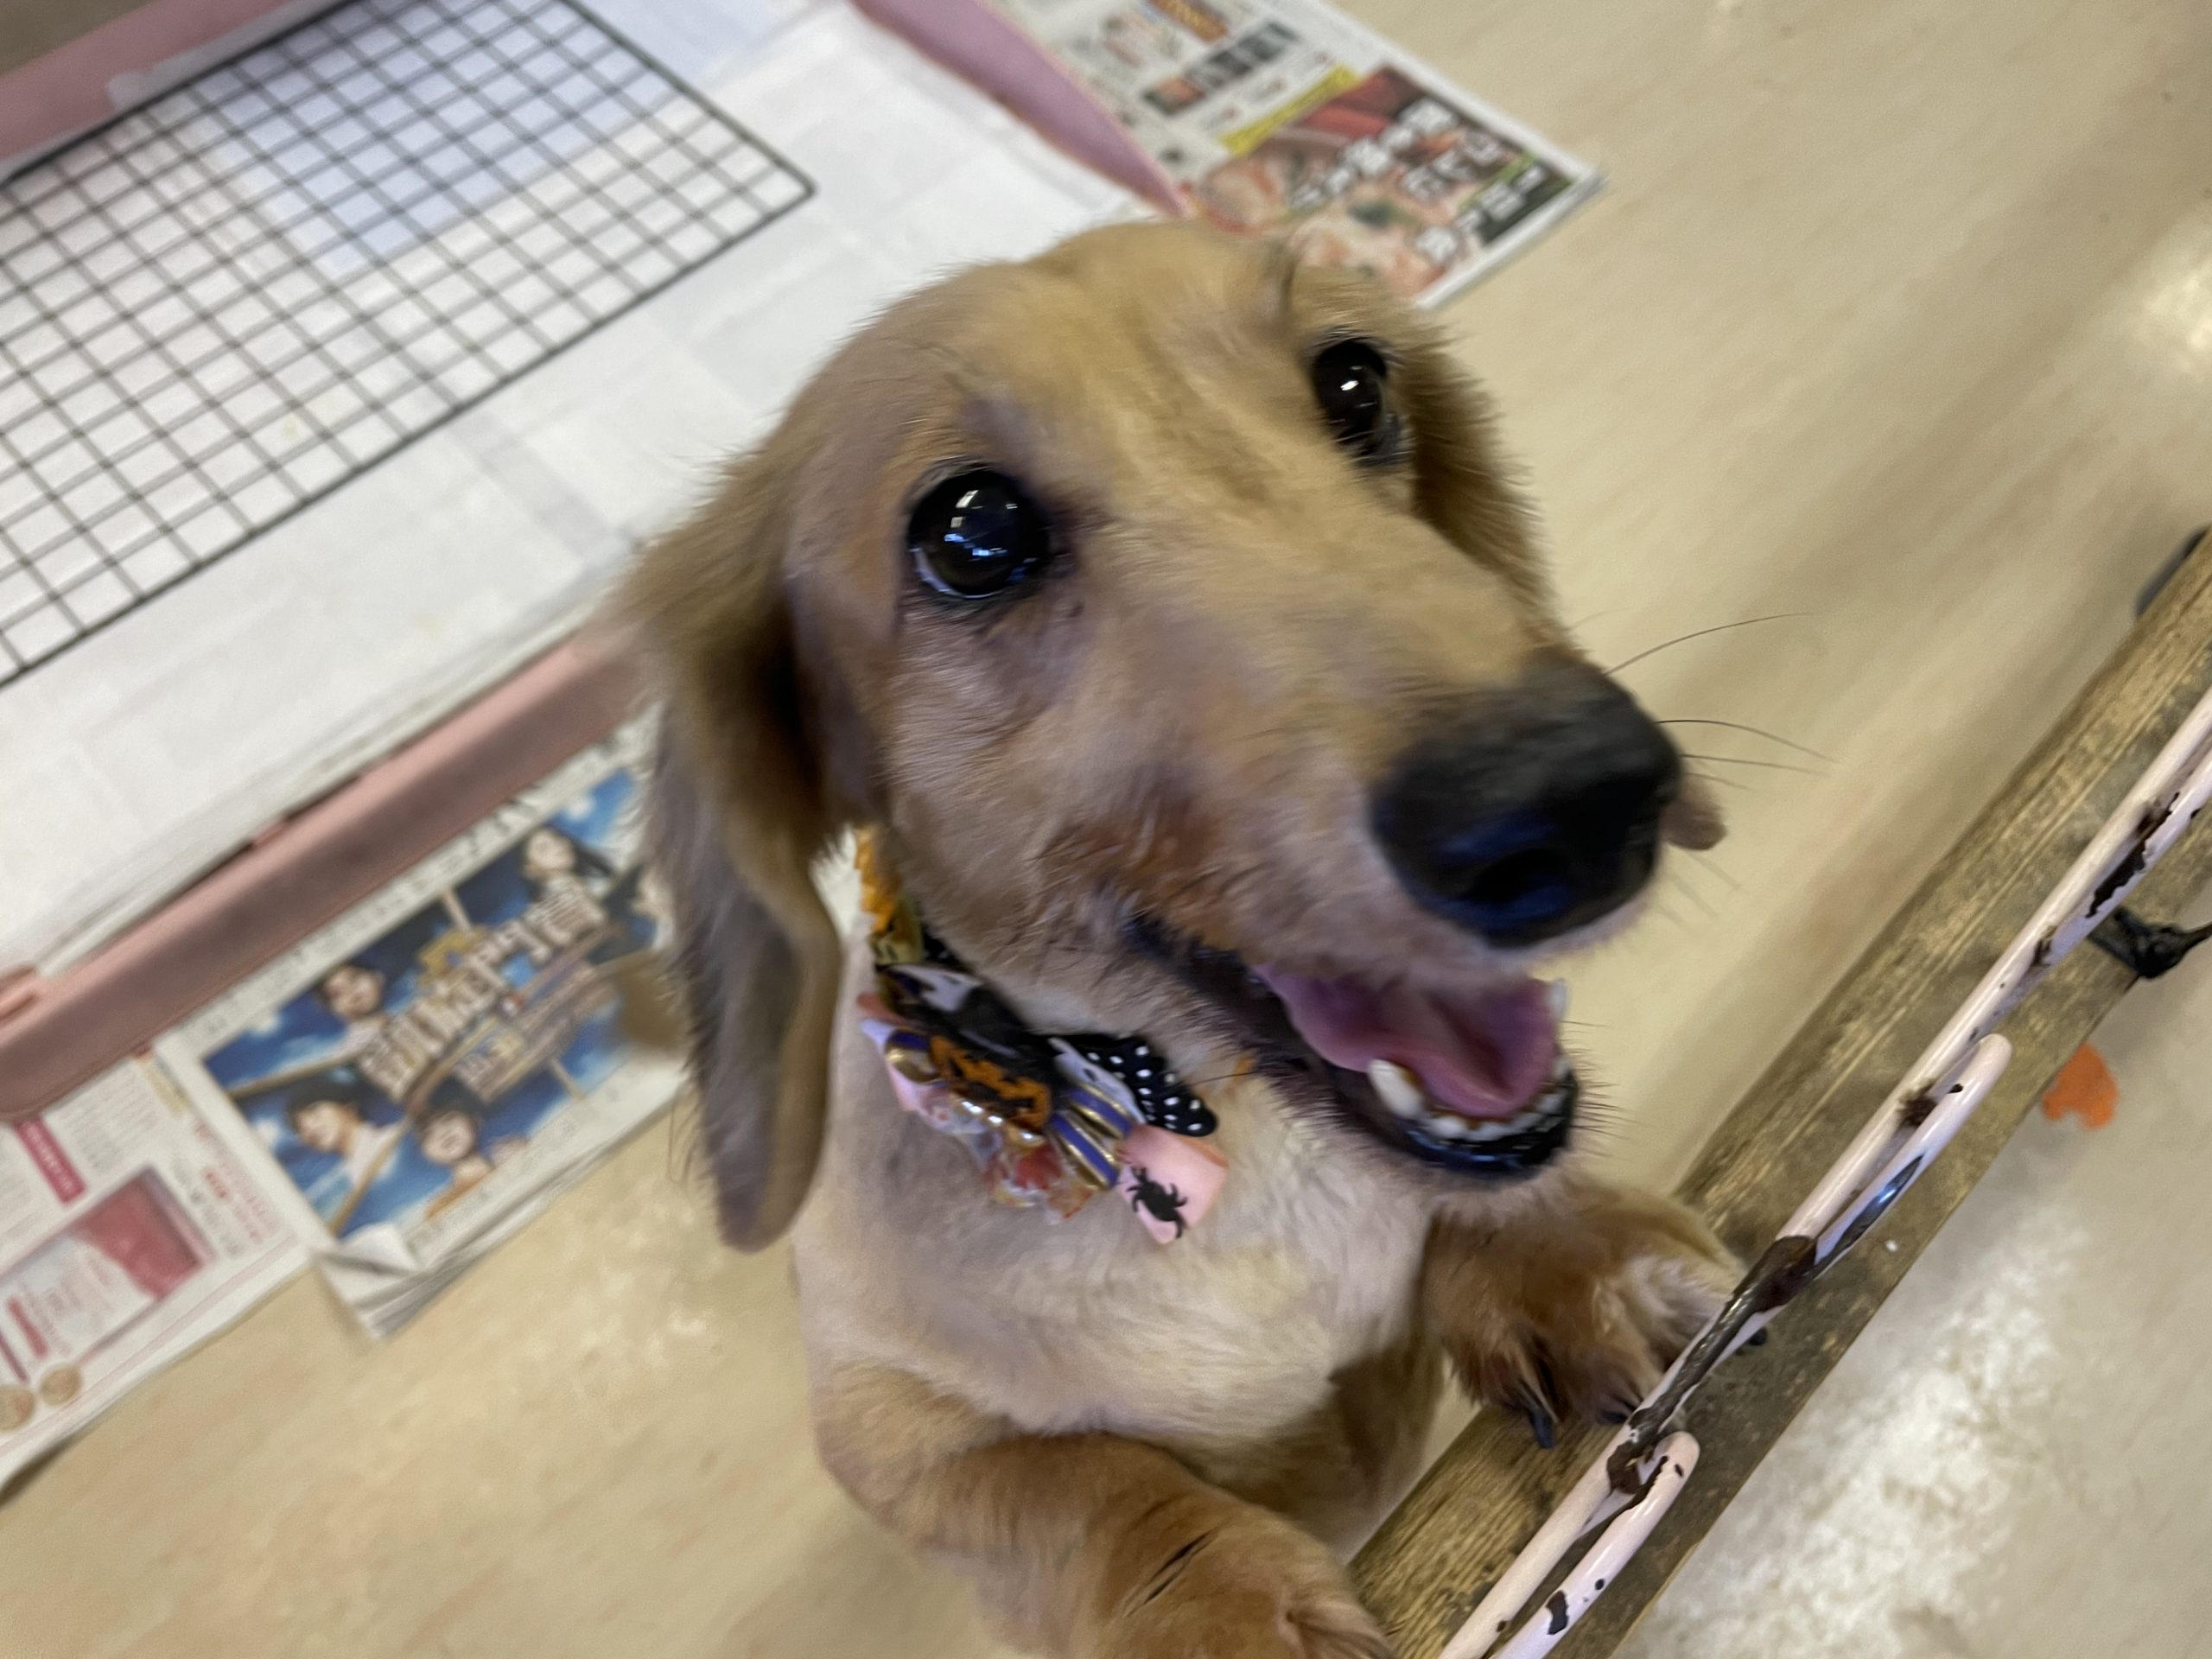 <ul> <li>犬種:ミニチュアダックス</li> <li>性別:女の子</li> <li>年齢:2011年~2012年頃生まれ</li> <li>保護経緯:病気療養のため飼育困難になり保護しました。</li> </ul>